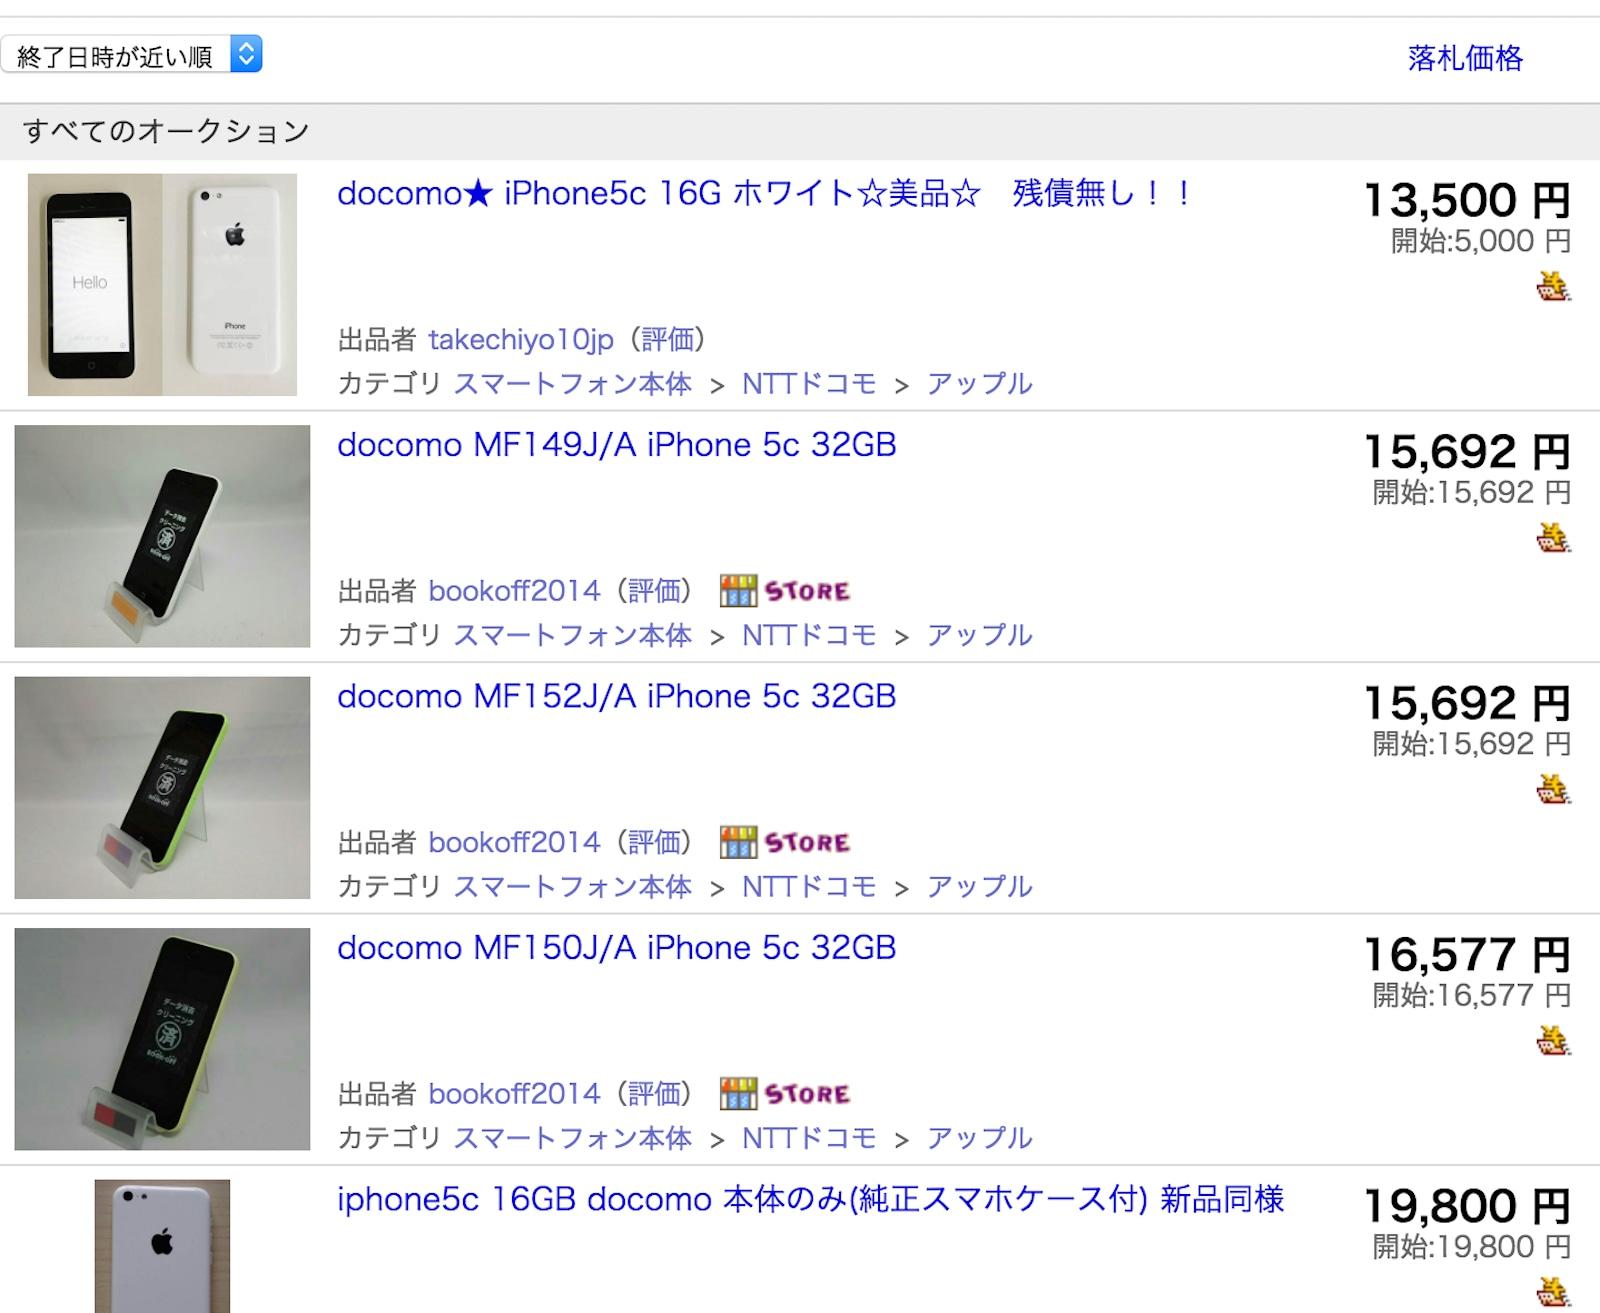 mvno-iphone5c-5c-yahoo-auction-price